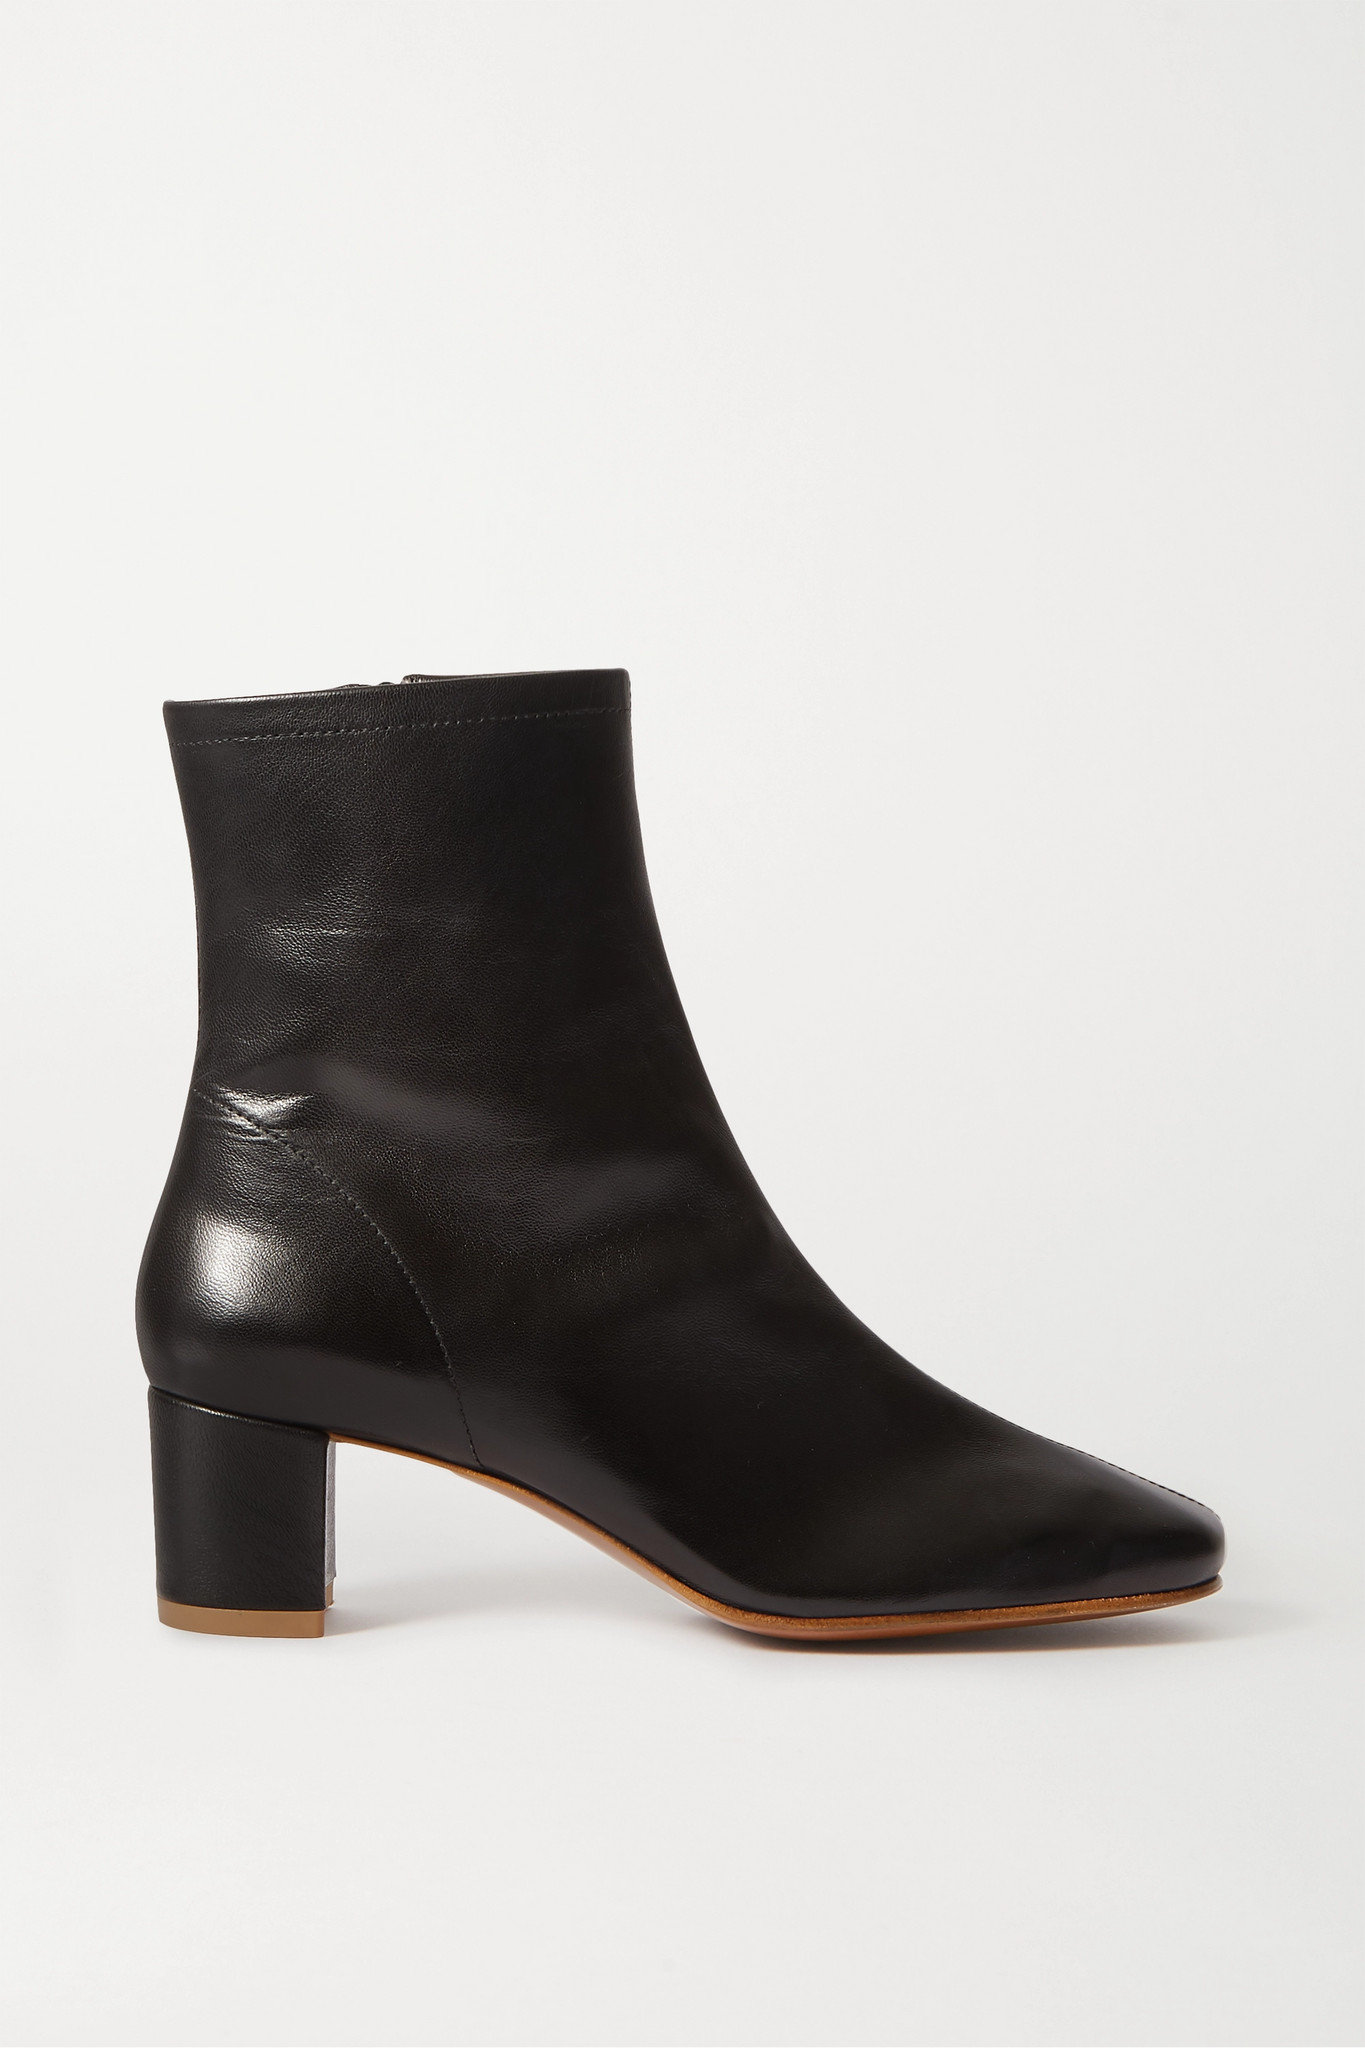 BY FAR - Sofia 皮革踝靴 - 黑色 - IT41